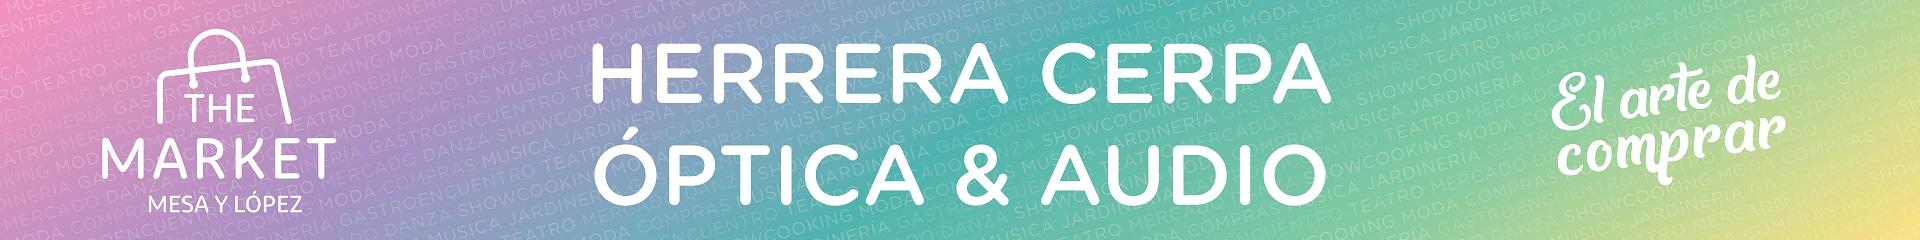 theMarket_cartelas_03_herrera cerpa óptica & audio